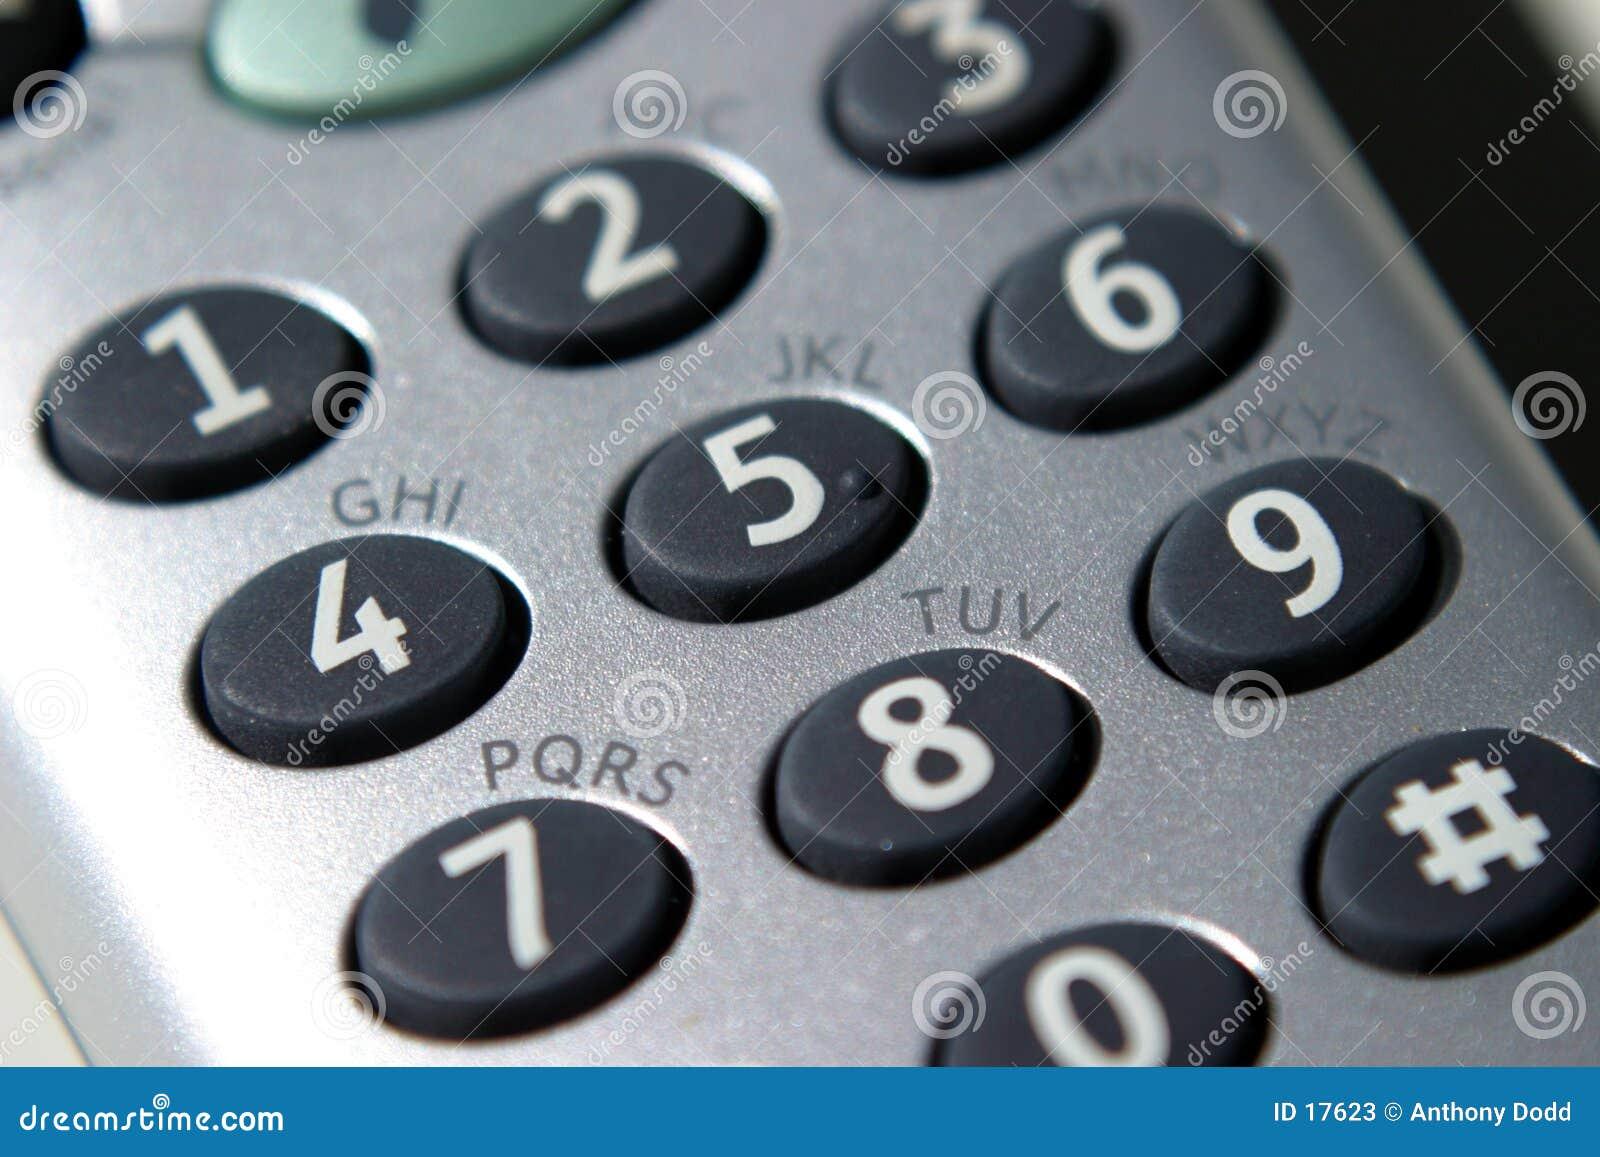 Teléfono, telclado numérico